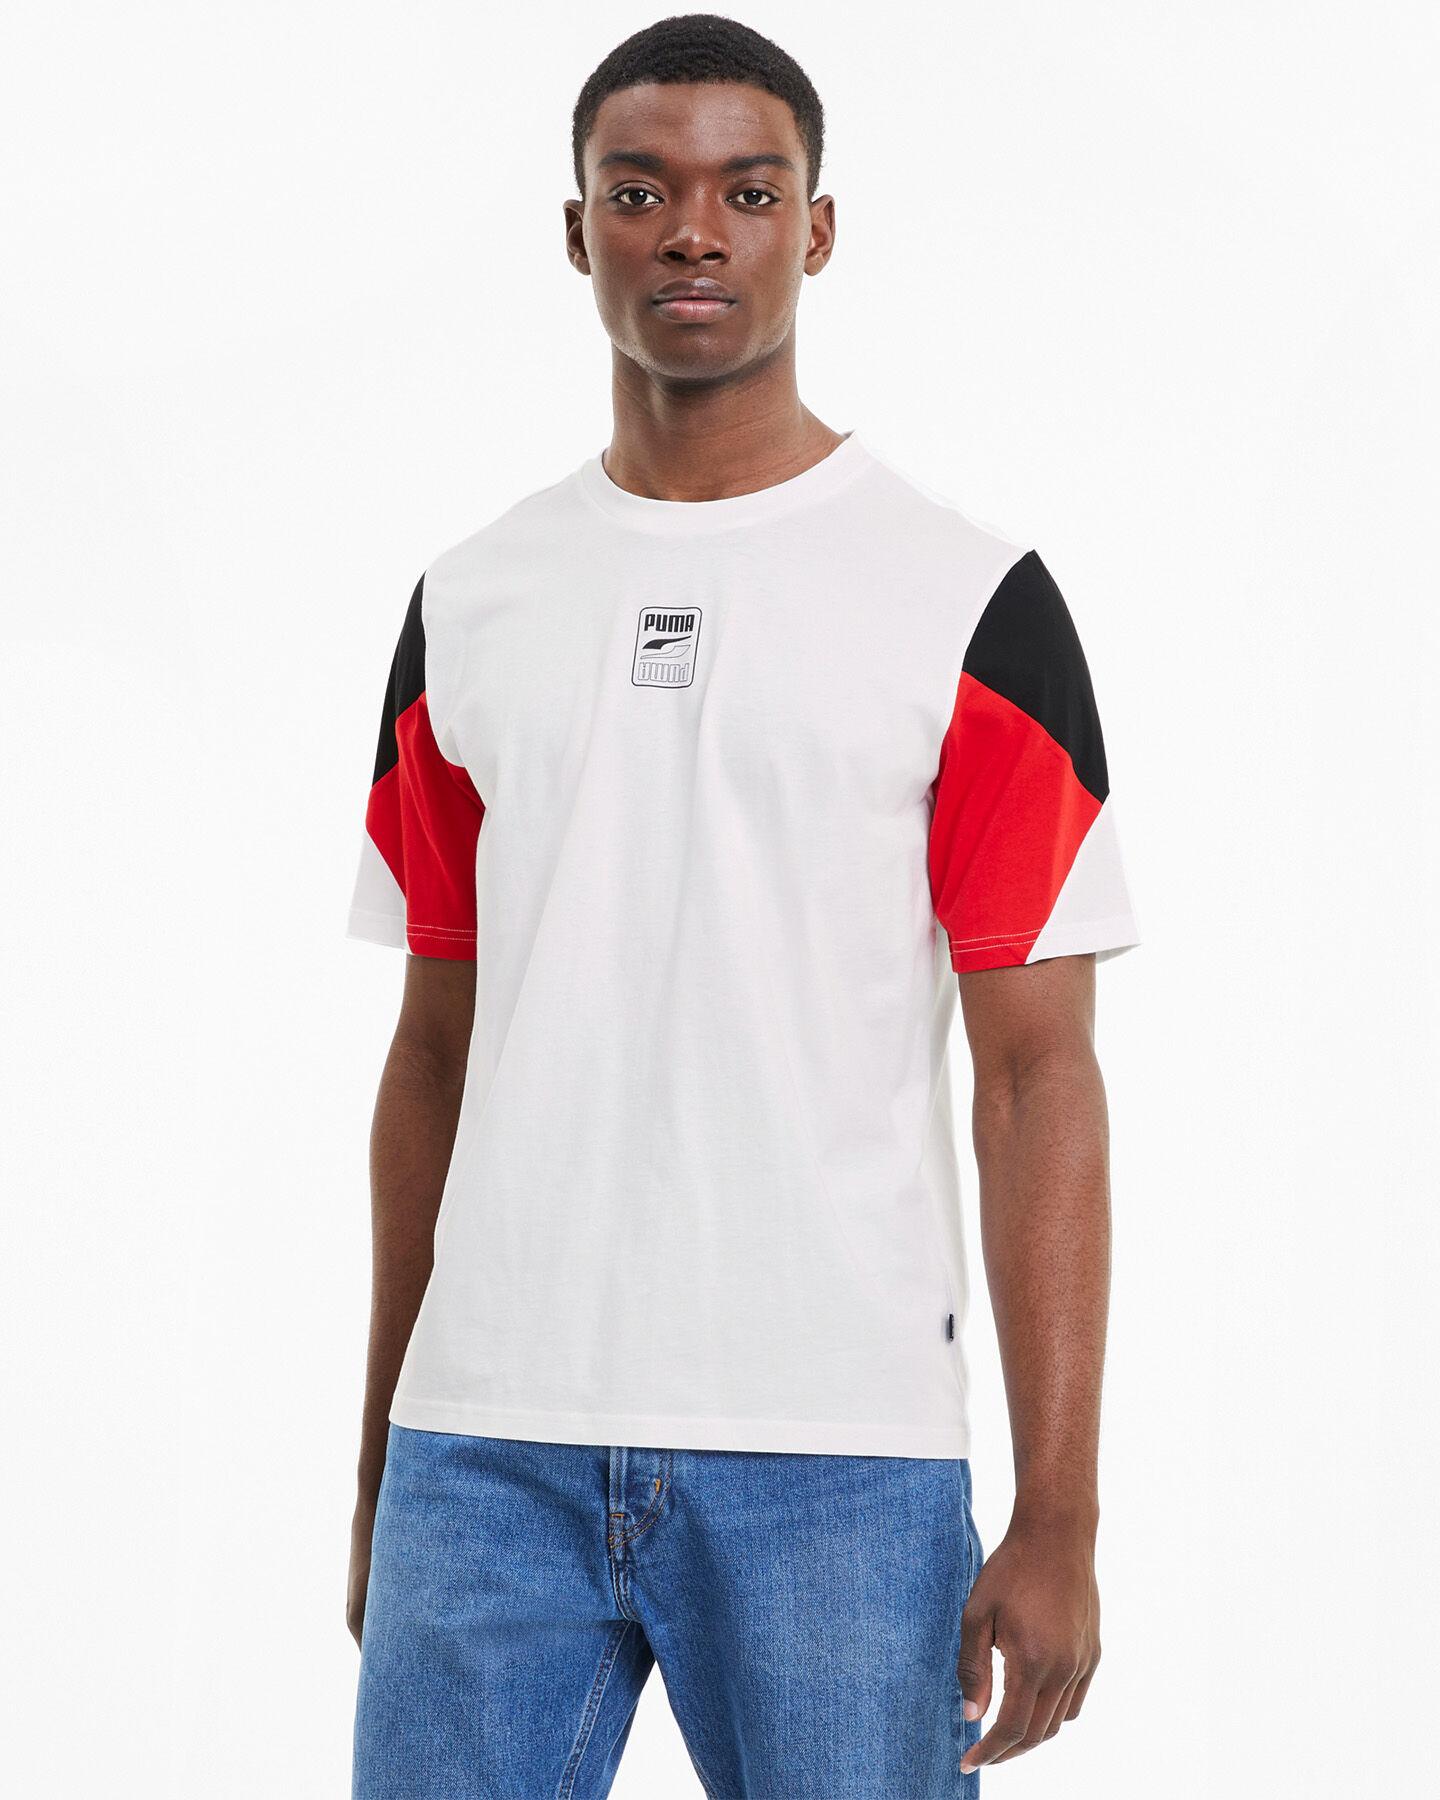 T-Shirt PUMA REBEL ADVANCED M S5235149 scatto 5